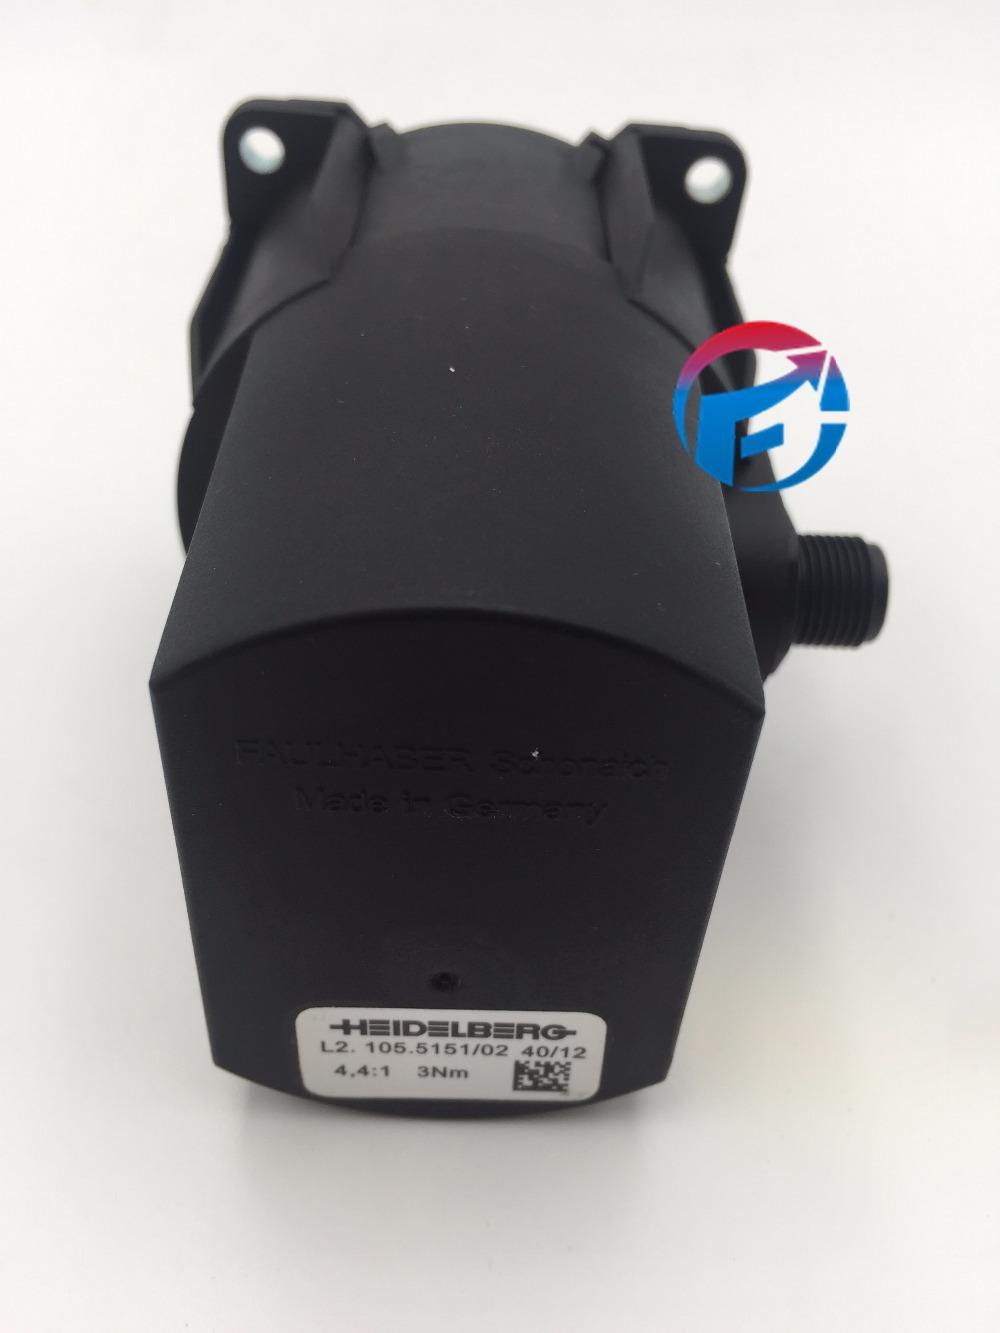 L21055151 02 441 3nm Register Pressure Motor For Sm74 Xl75 Servo Board Heidelberg Circuit Printing Machine